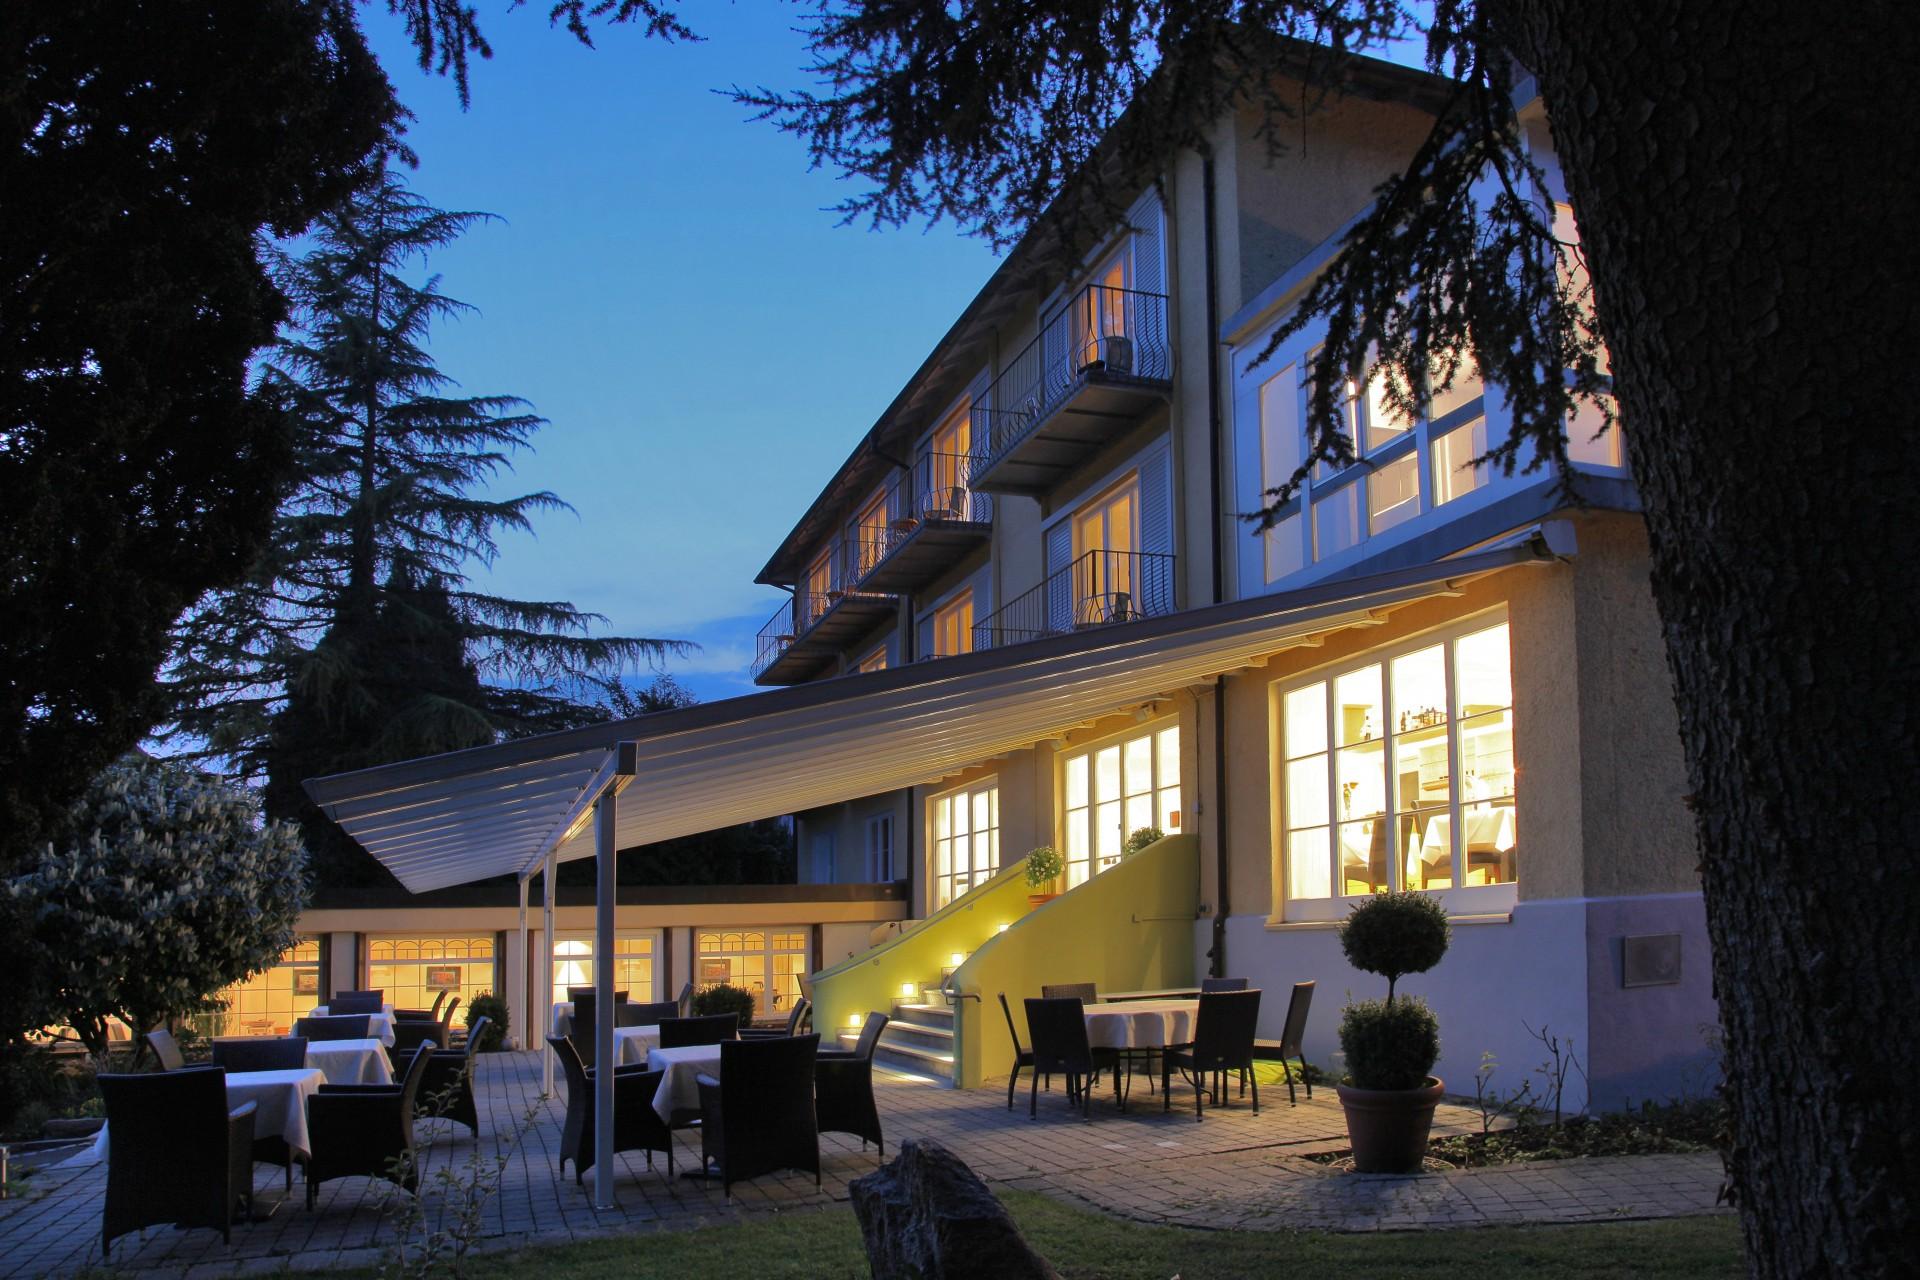 Hotel Lindenallee In Lindau Bei Dunkelheit